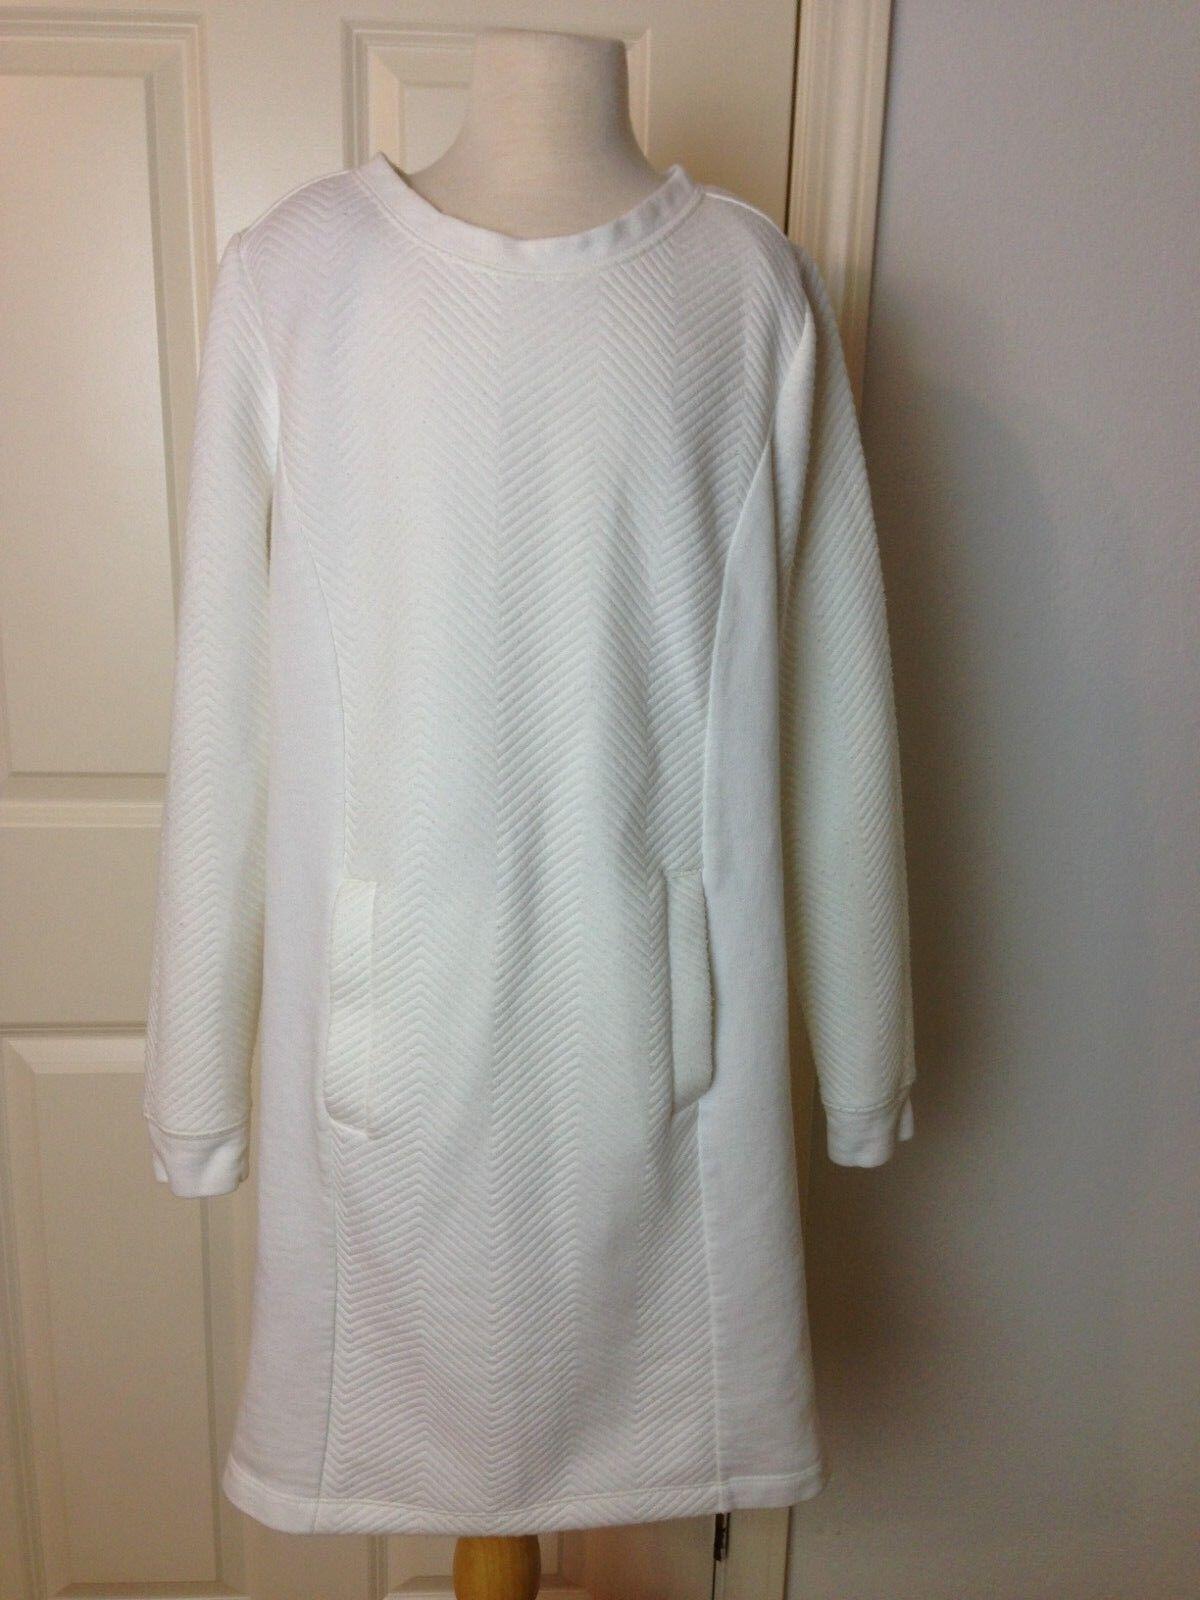 Ann Taylor LOFT Quilted Herringbone Sweatshirt Dress White Long Sleeve Sz Small